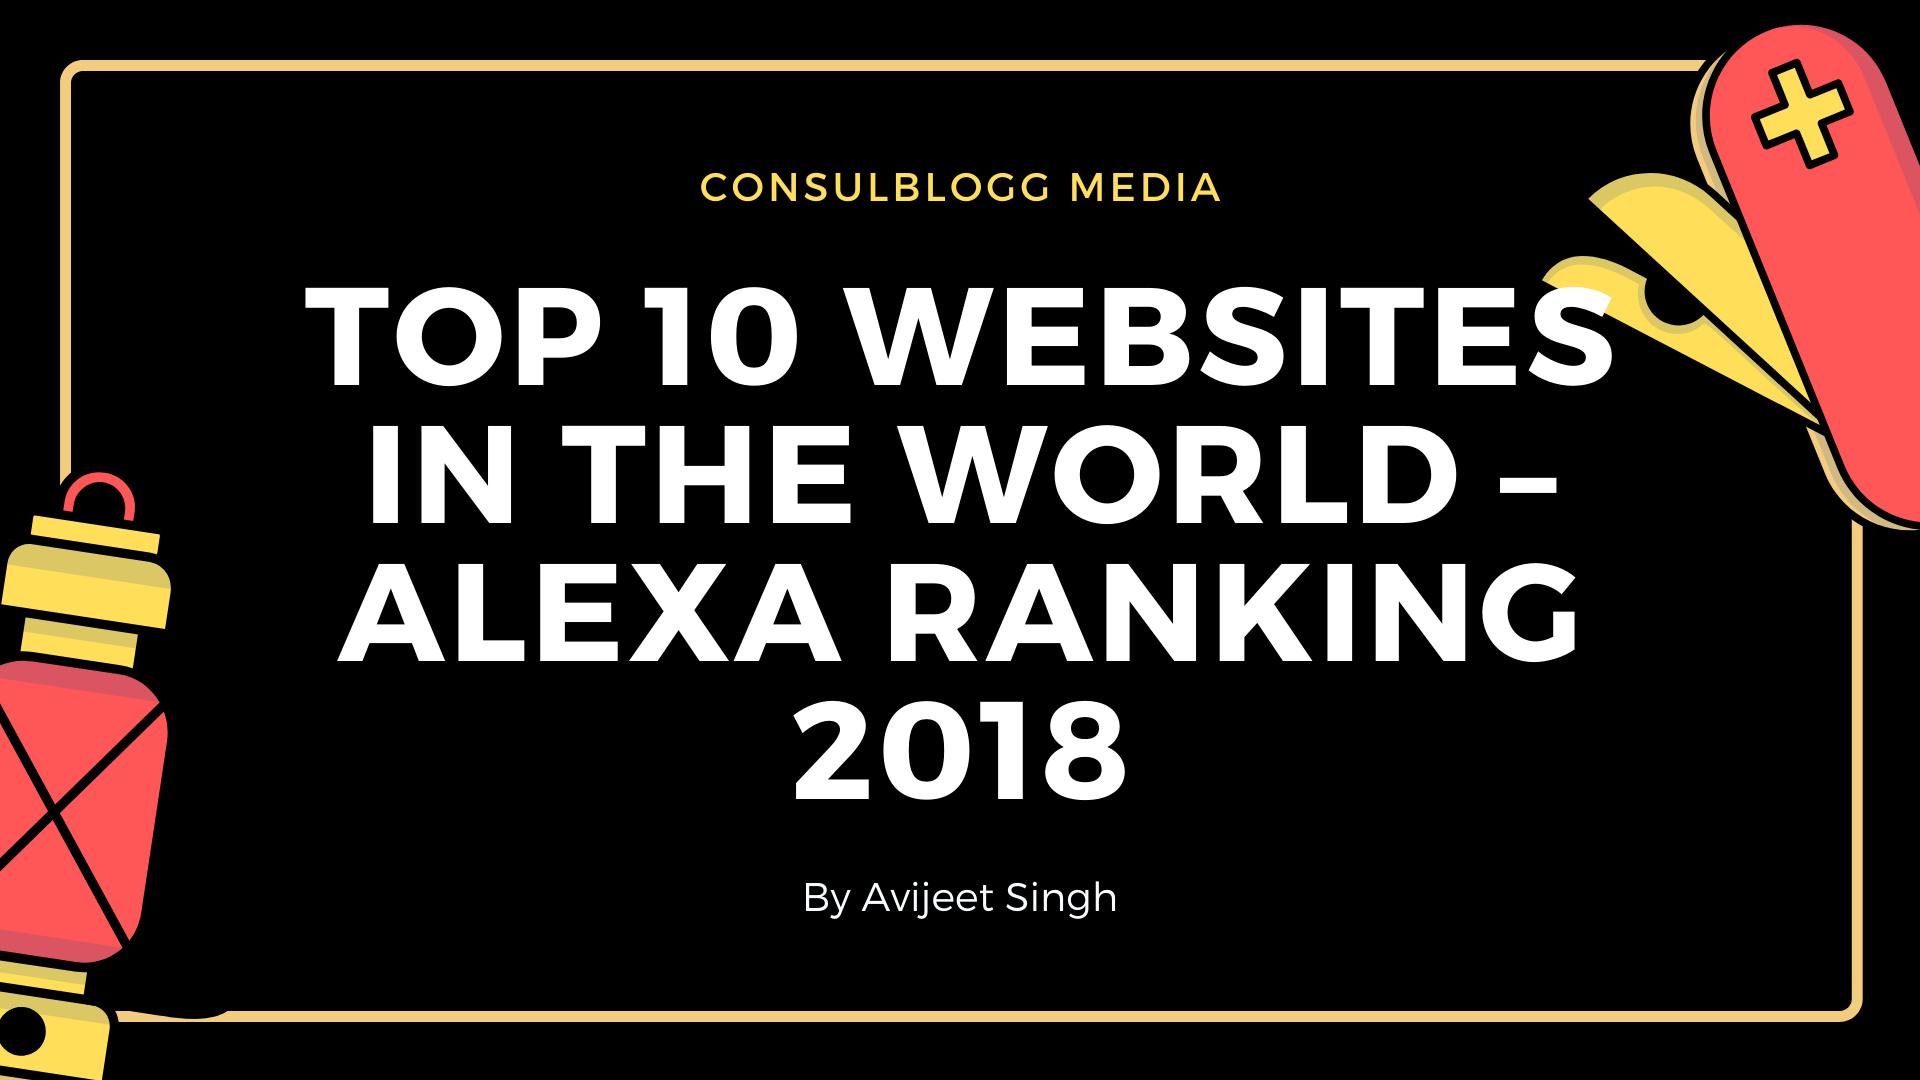 Top 10 Websites In The World – Alexa Ranking 2018